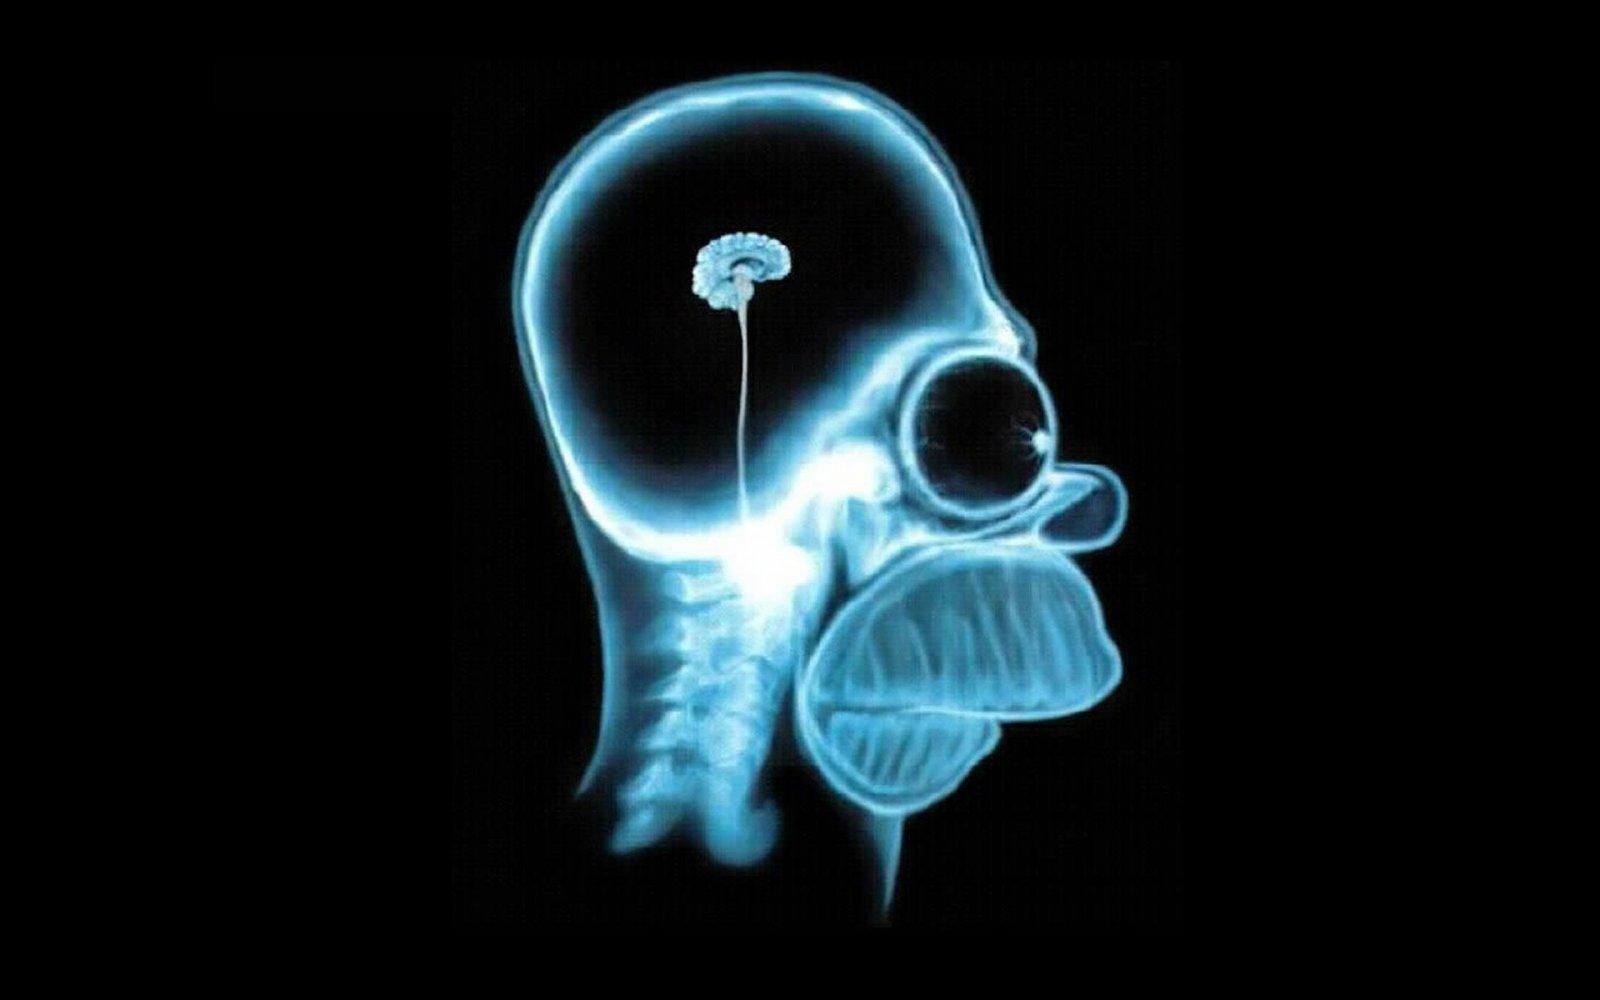 brain-homer-simpson.jpg